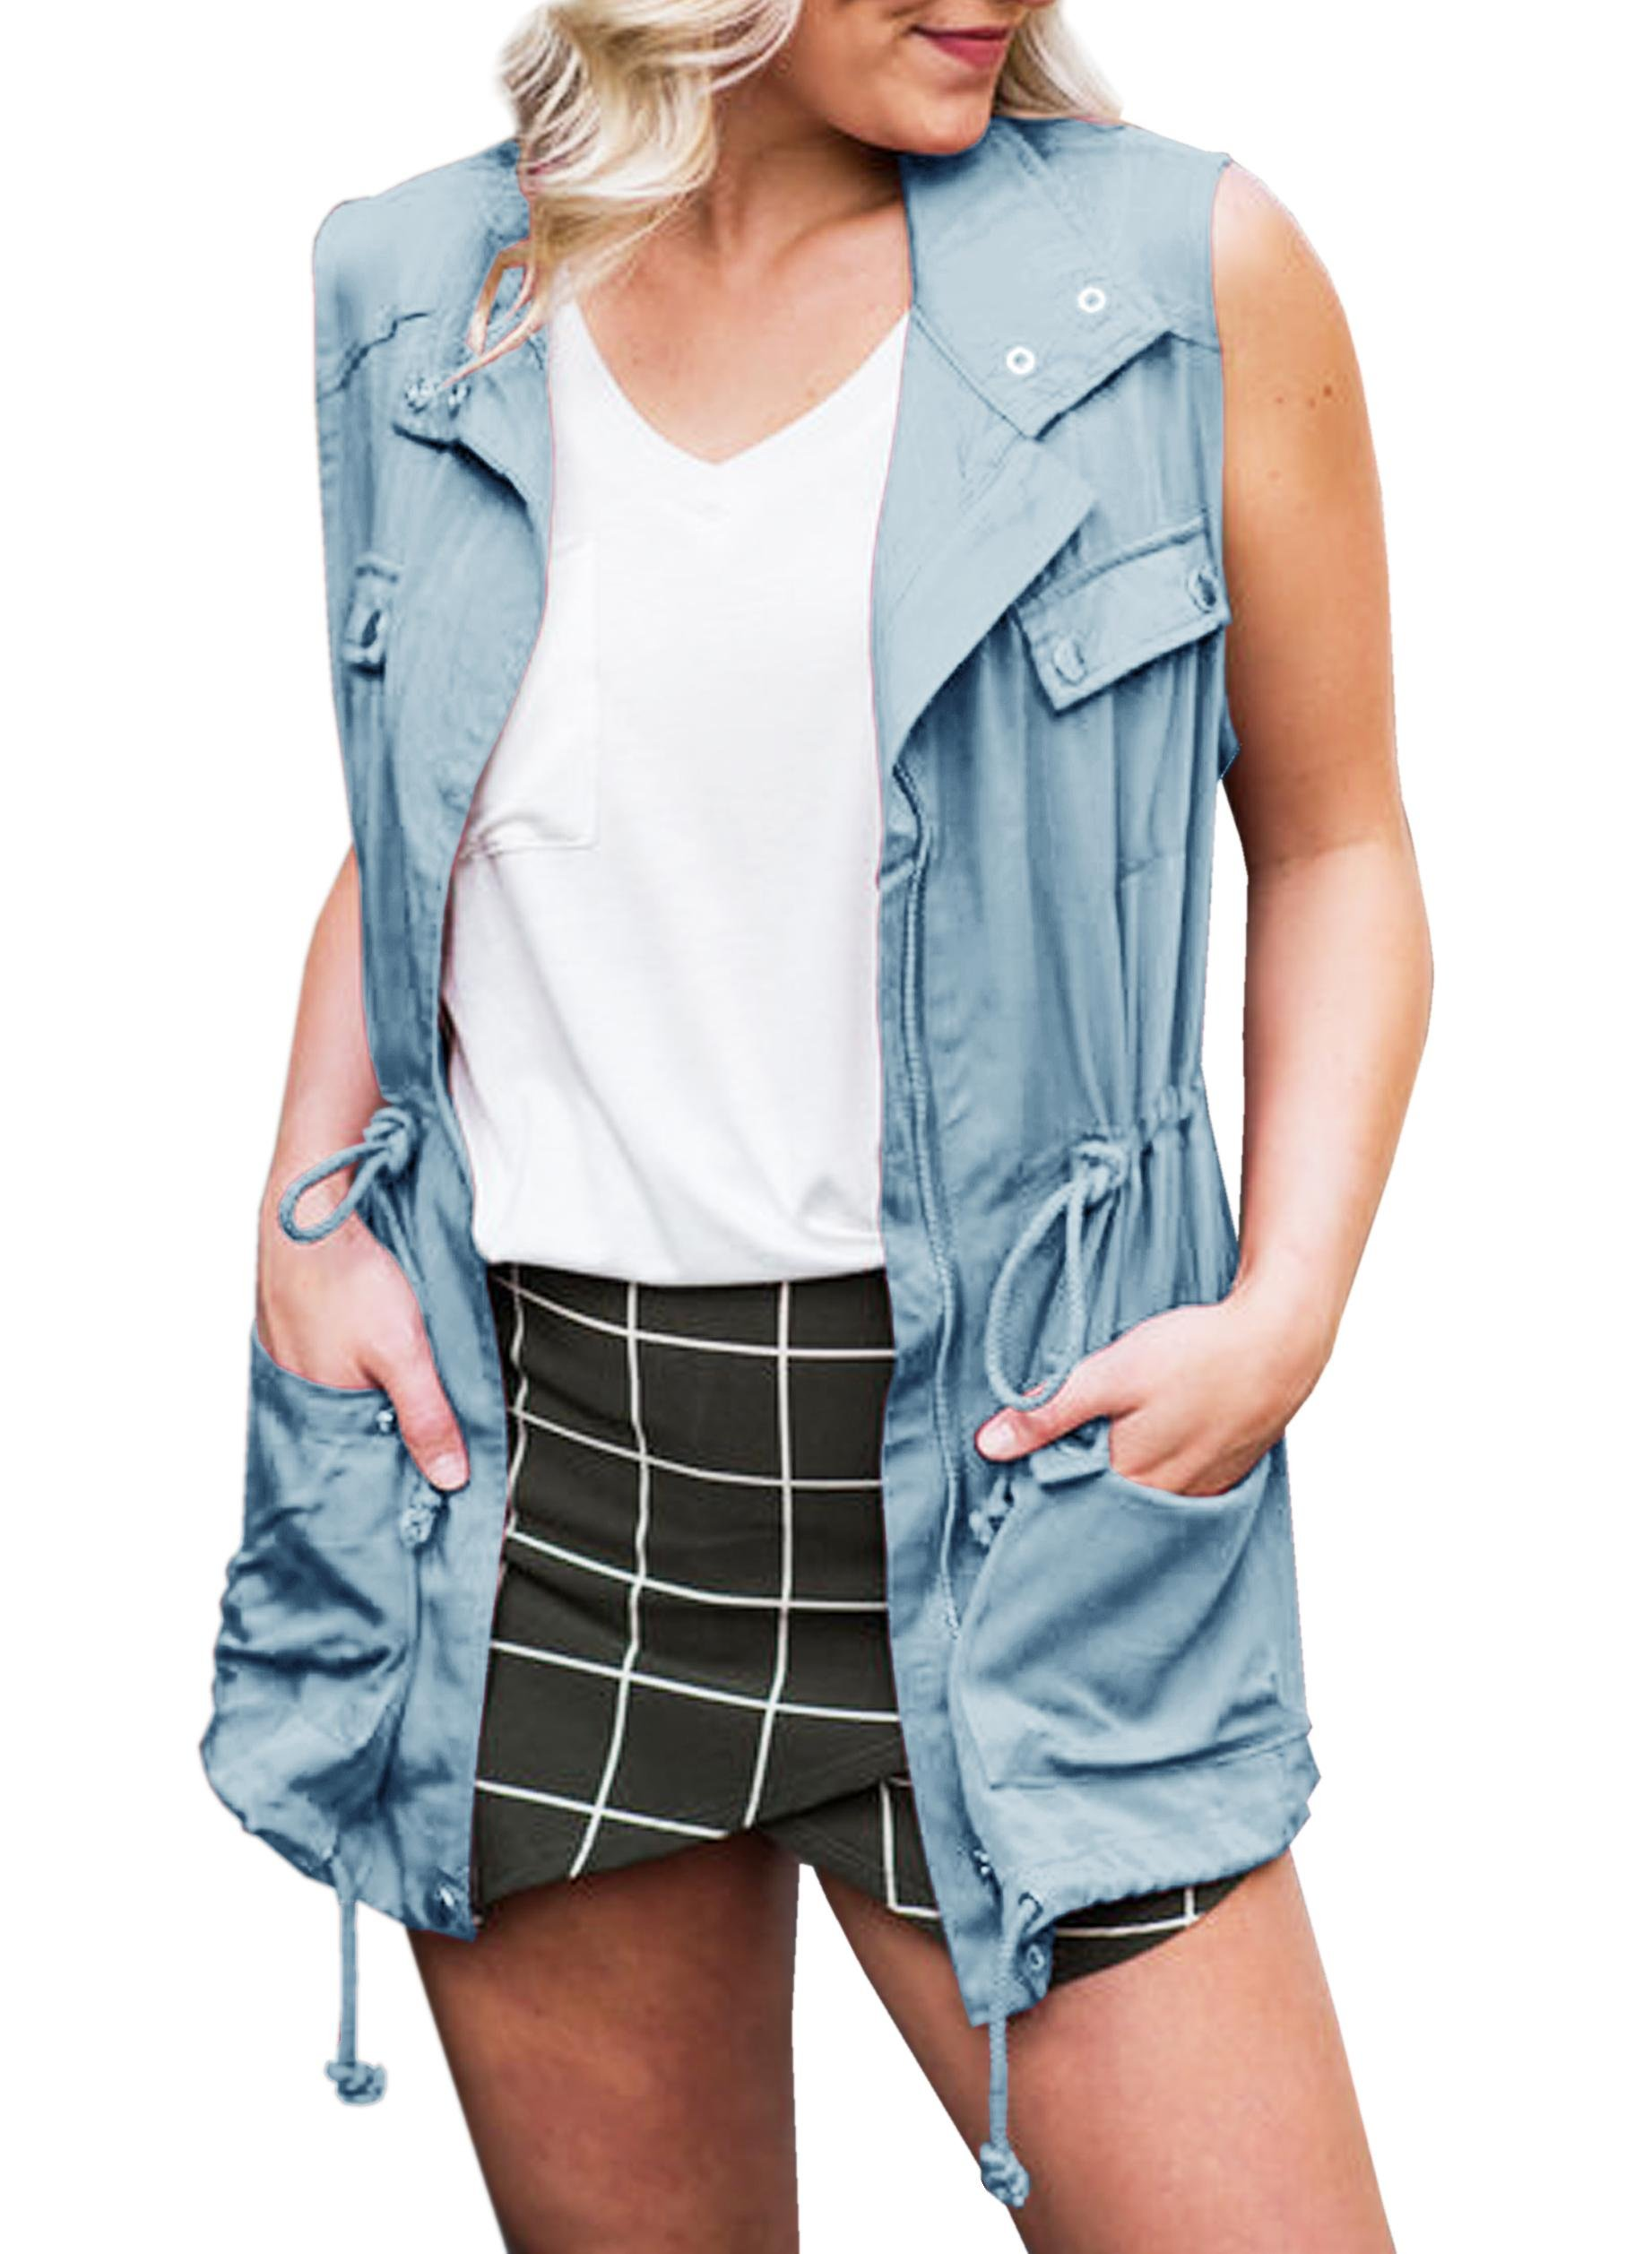 Ofenbuy Womens Casual Sleeveless Jacket Lightweight Military Drawstring Jacket Vest with Pockets